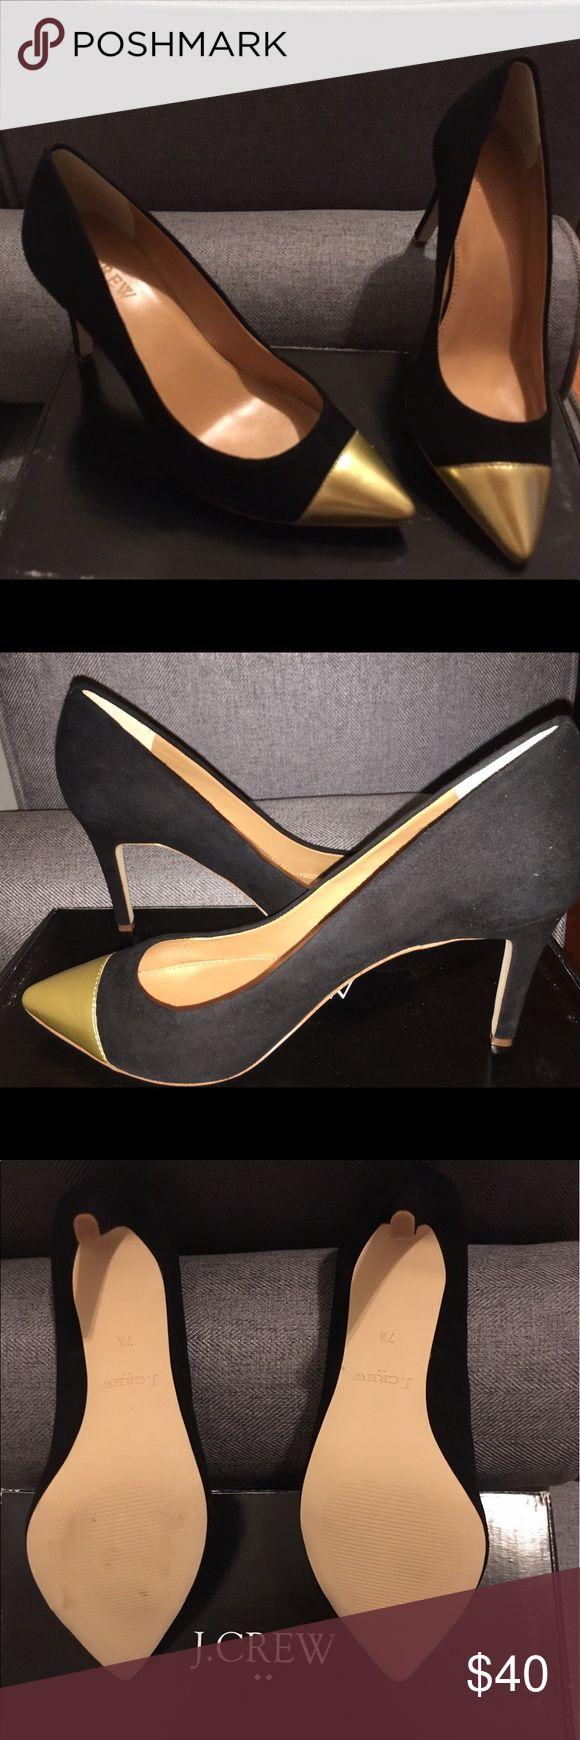 "J. Crew - Sasha Suede Black And Gold Pumps Suede Black And Gold 4"" Pumps - Never Worn J. Crew Shoes Heels"